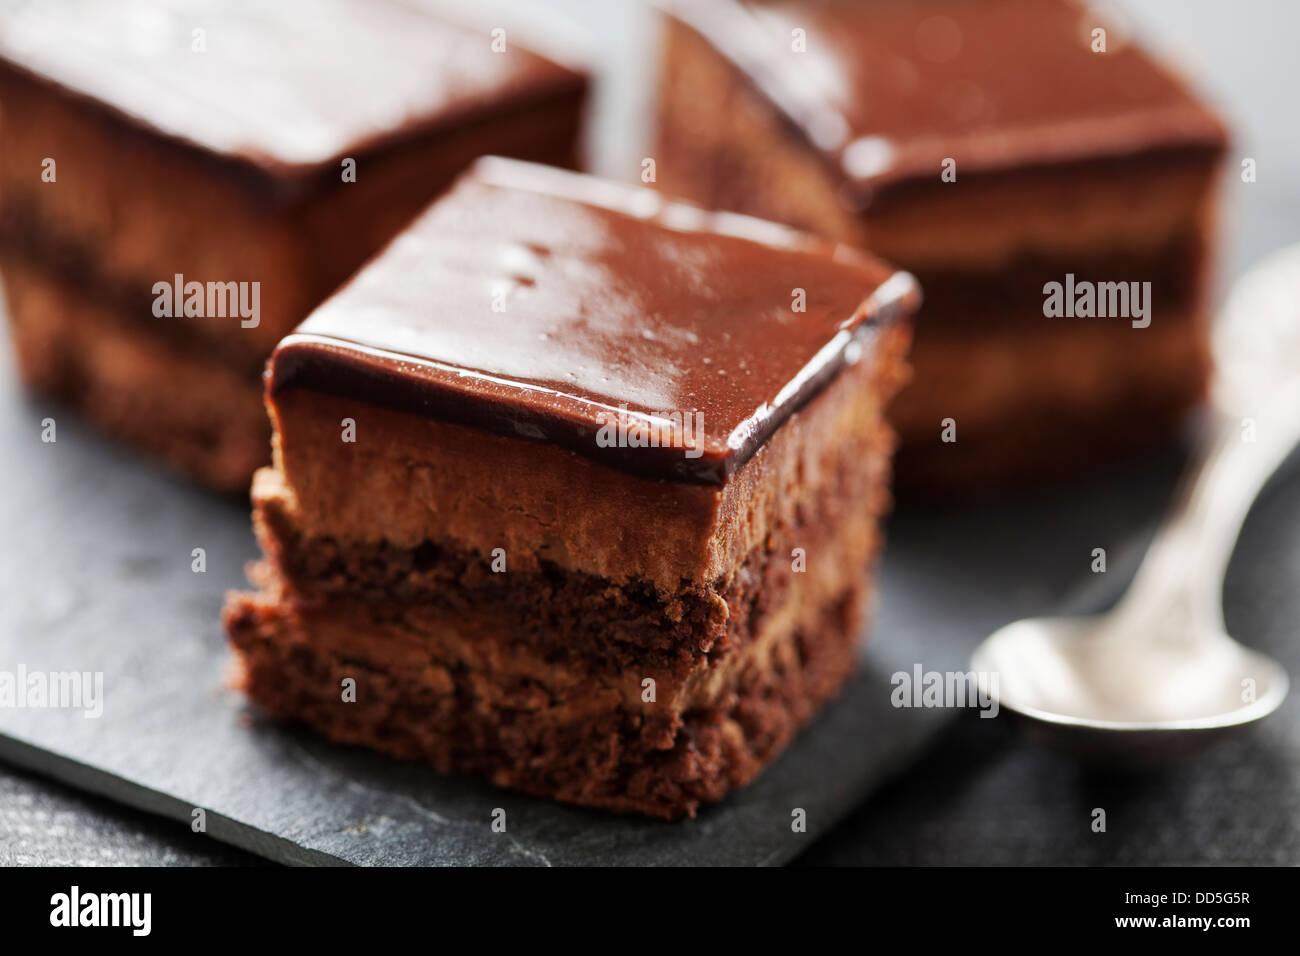 chocolate layer cake - Stock Image